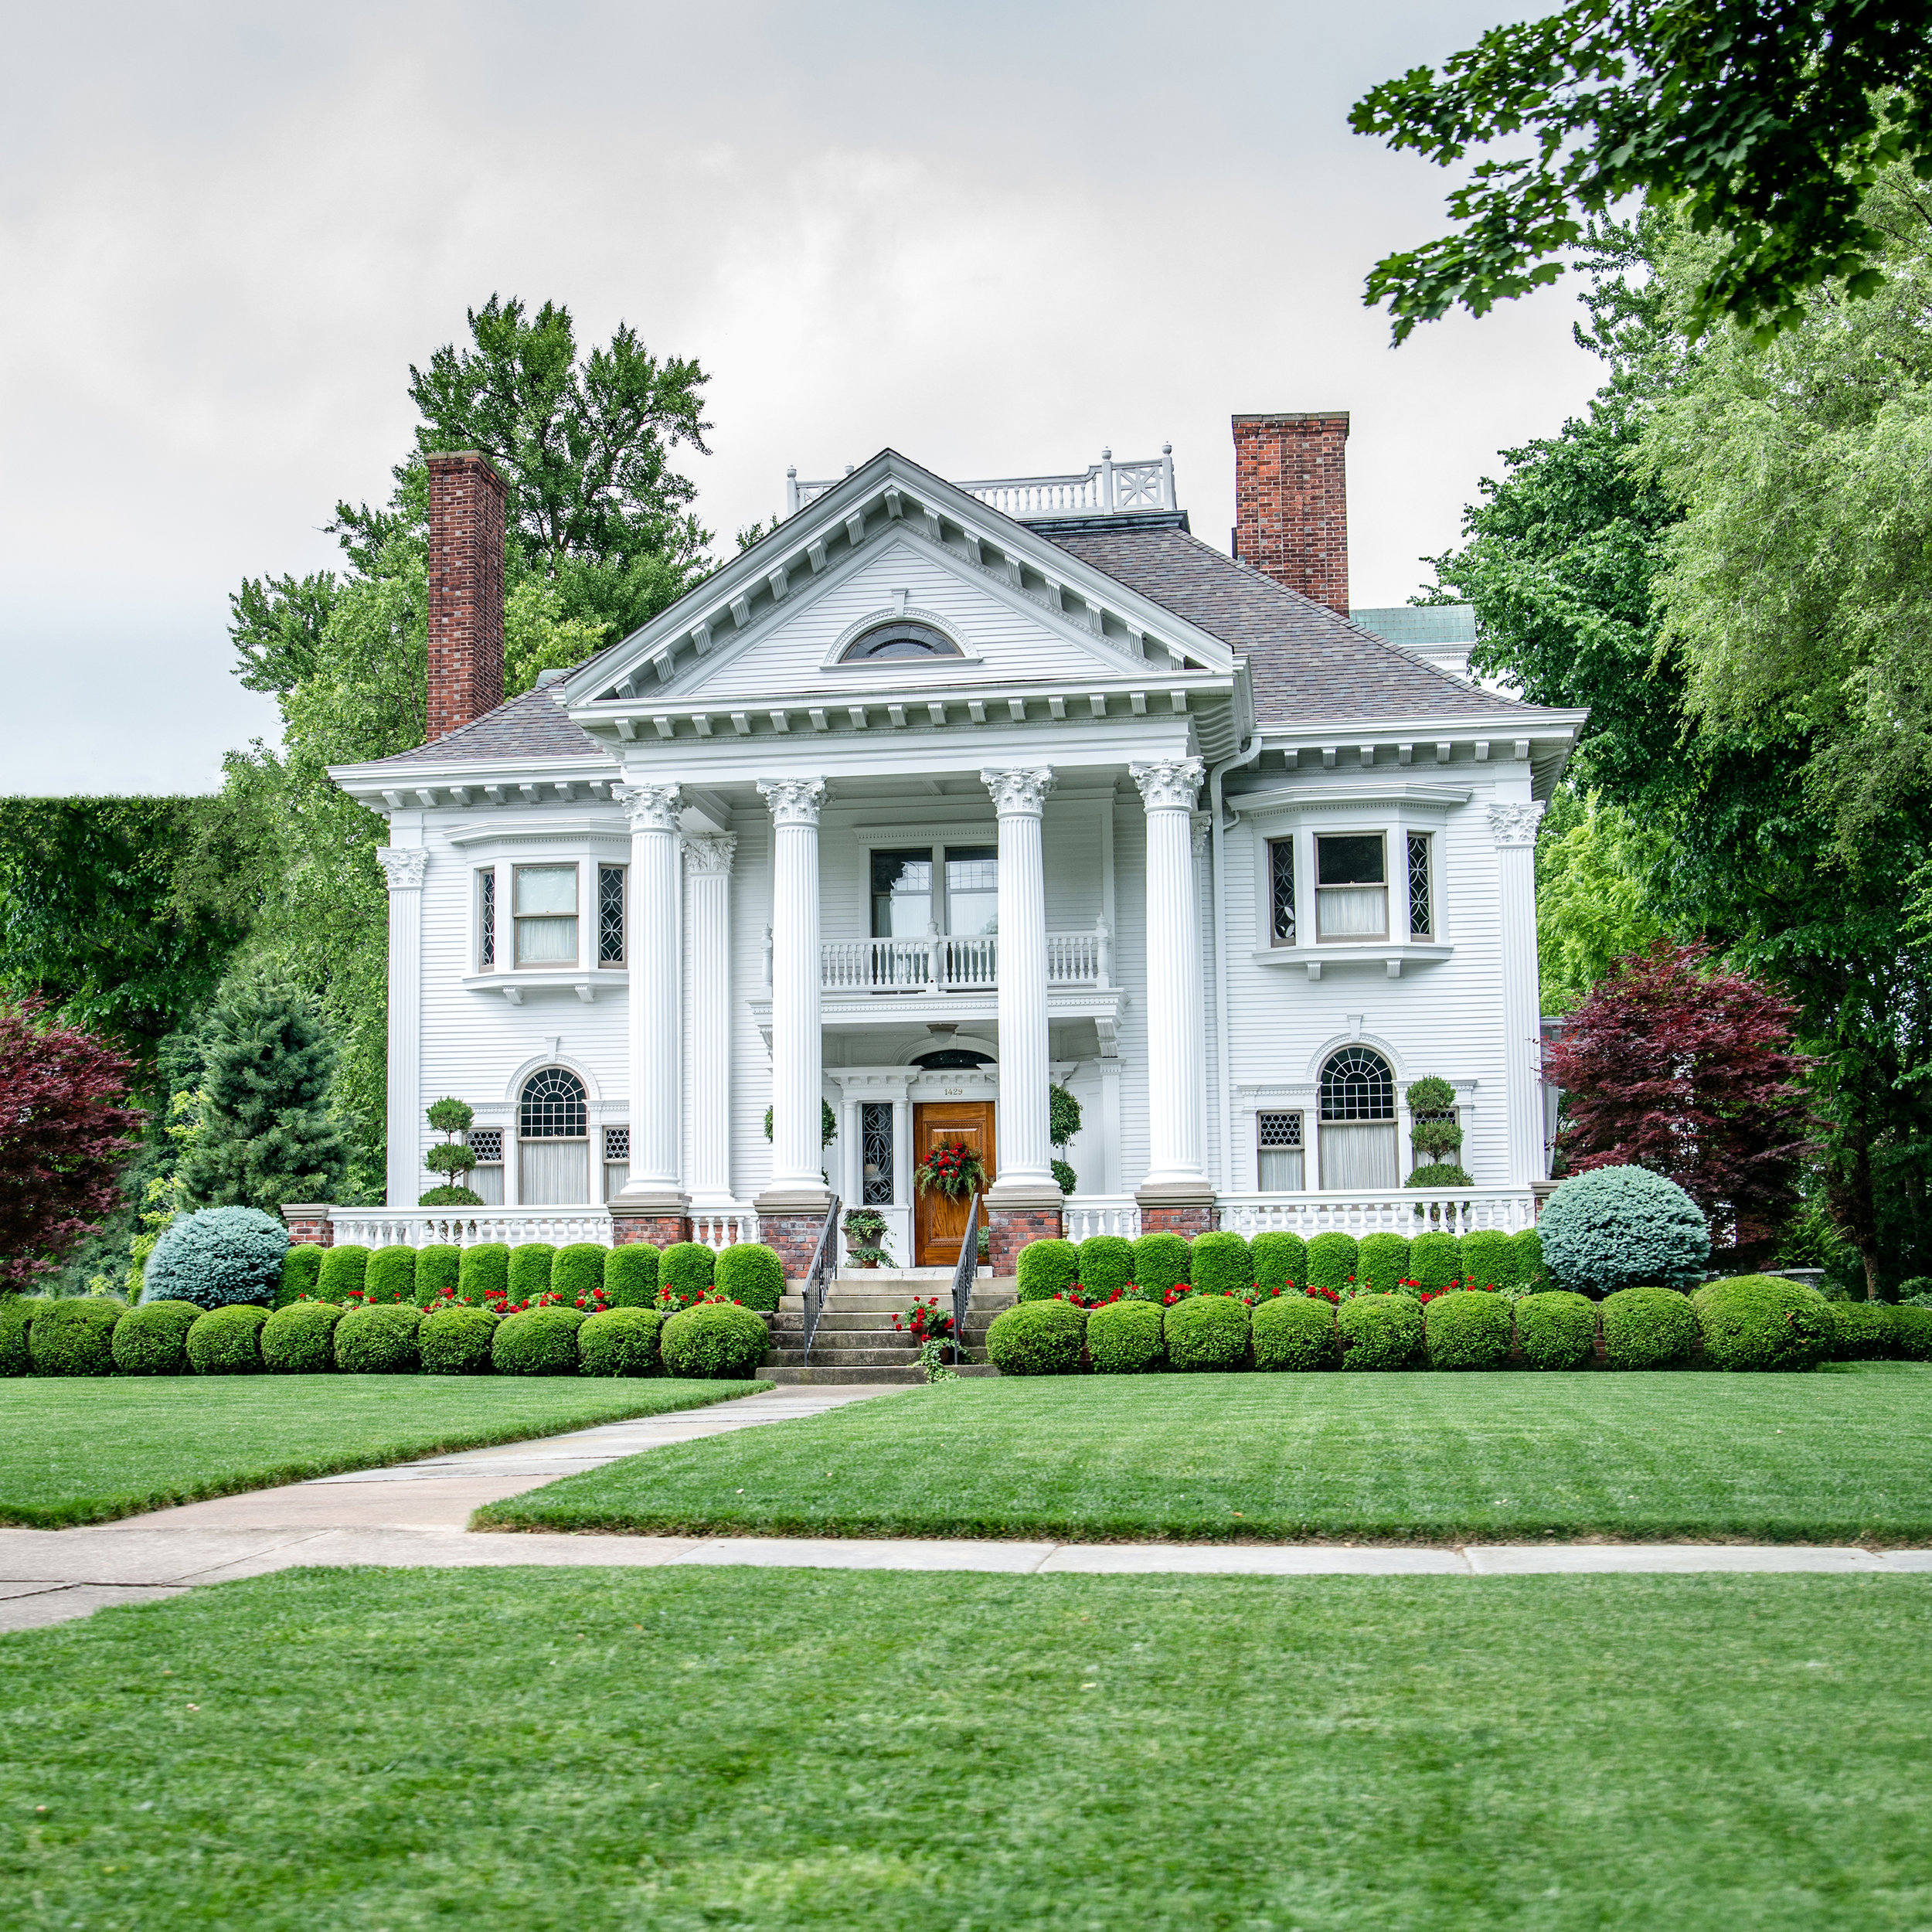 Americana_historictown_sandusky_ohio_jbogerphotography (4).jpg